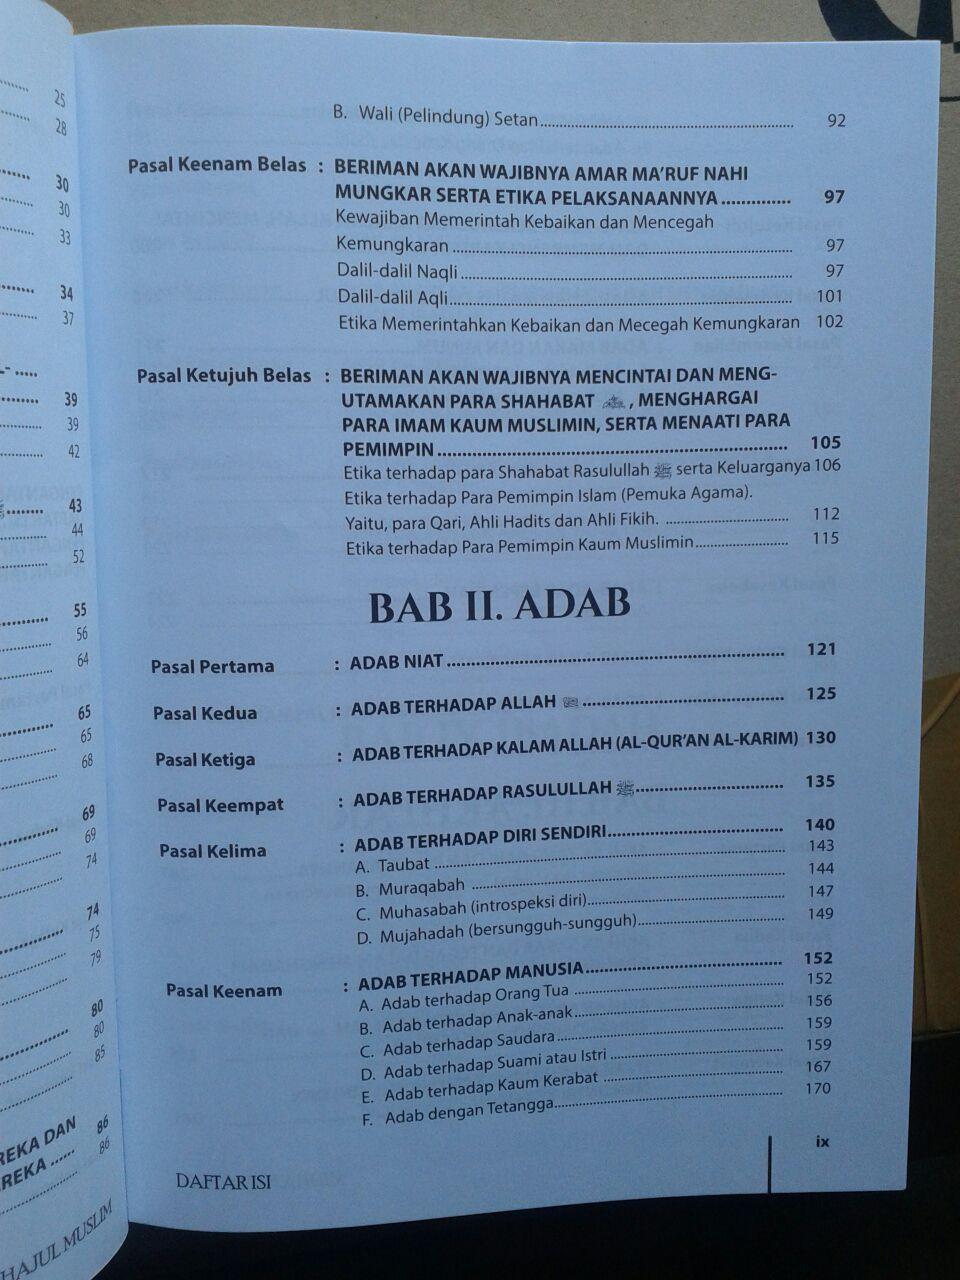 Buku Minhajul Muslim Pedoman Hidup Ideal Seorang Muslim isi 3